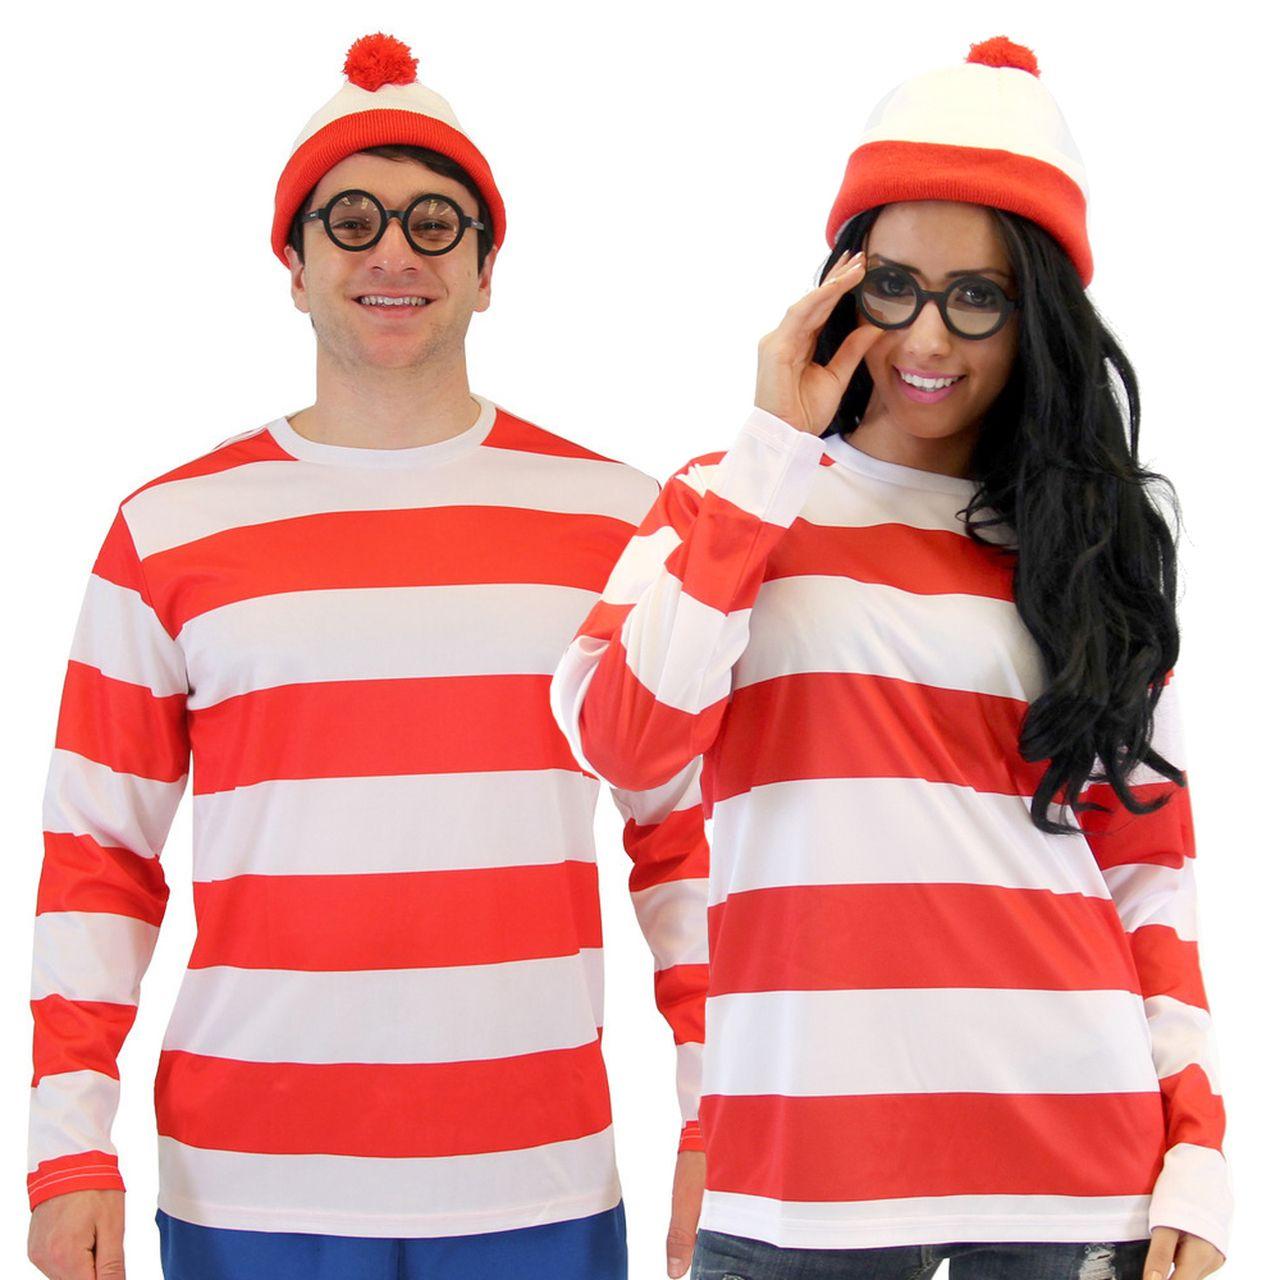 Where's Waldo DELUXE Adult Costume Set Easy halloween